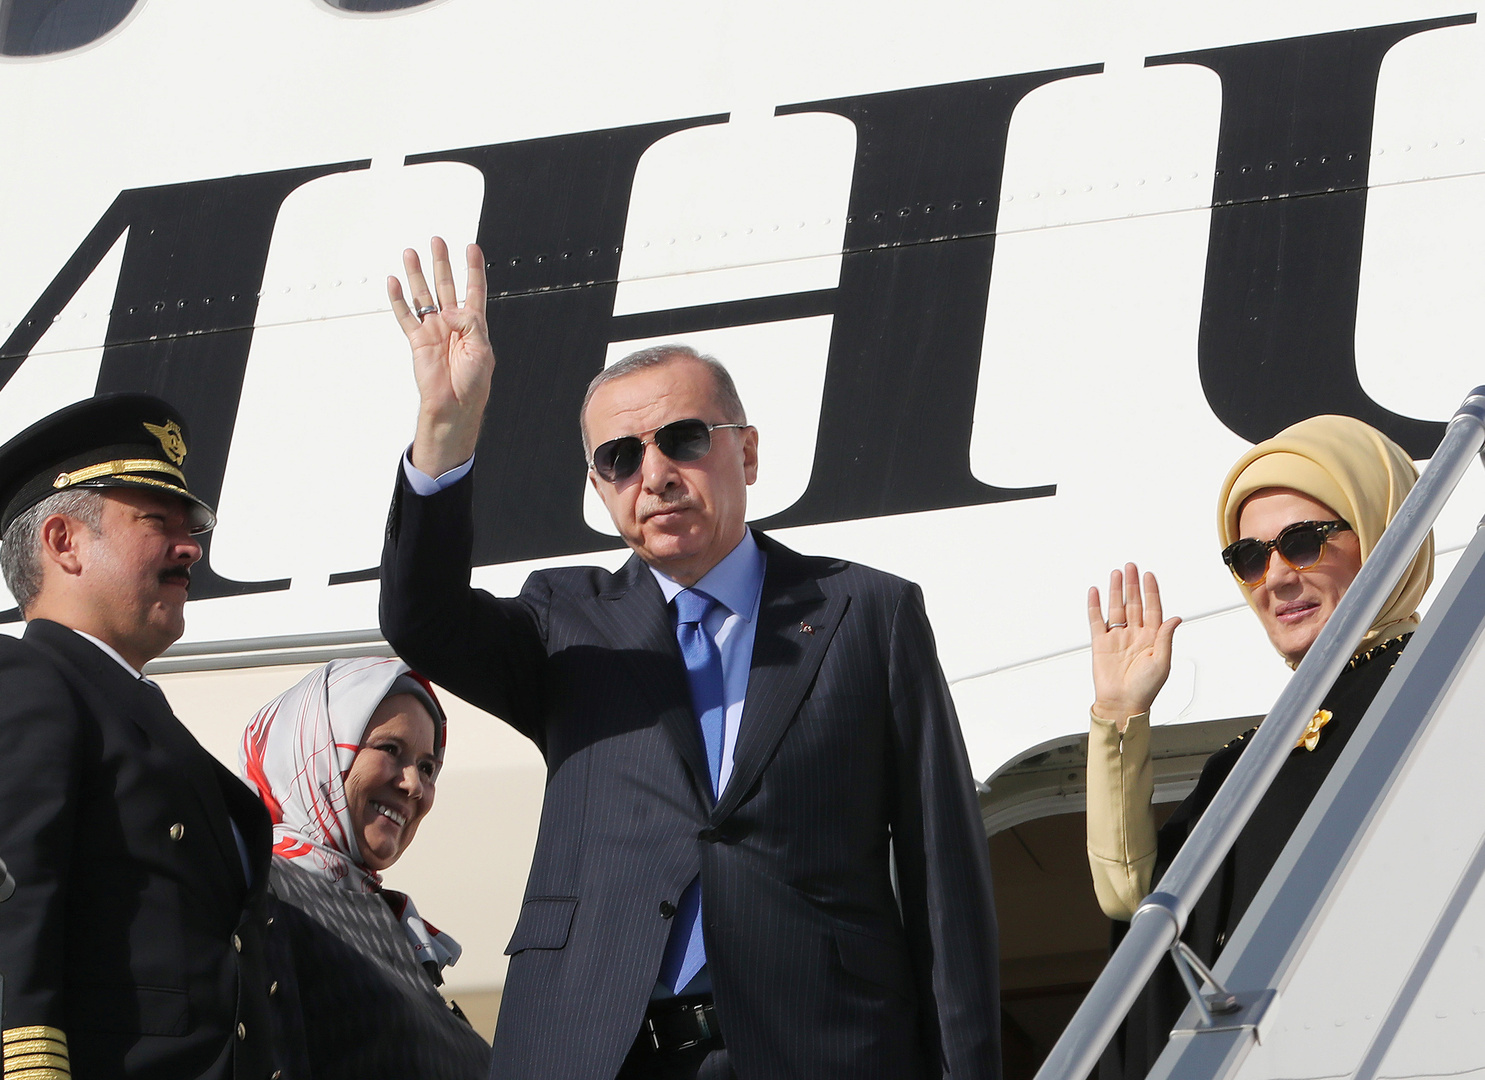 بالفيديو.. واشنطن تستقبل أردوغان بالمظاهرات